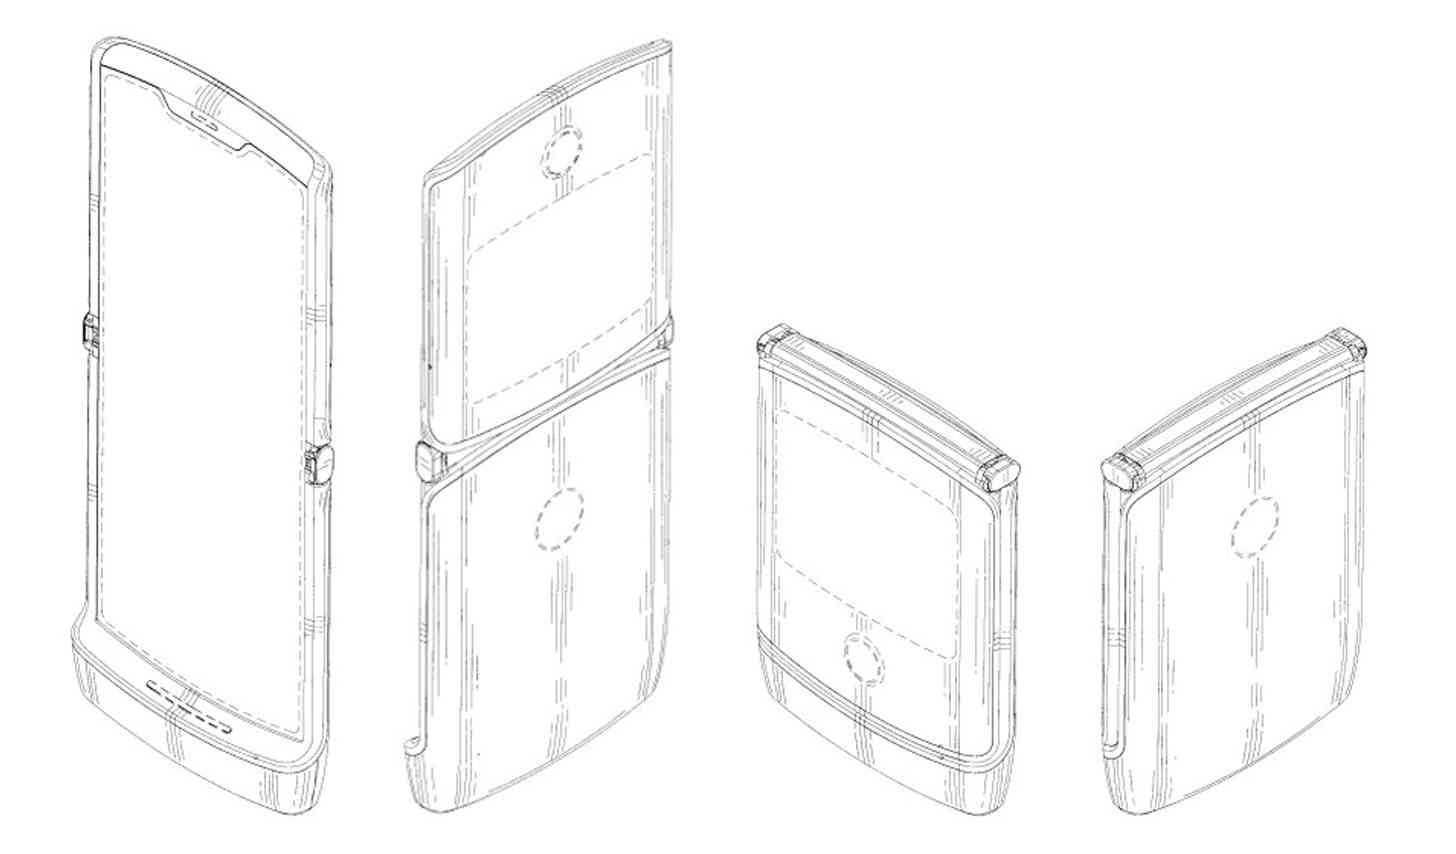 Motorola Razr foldable for Verizon leaked again, this time